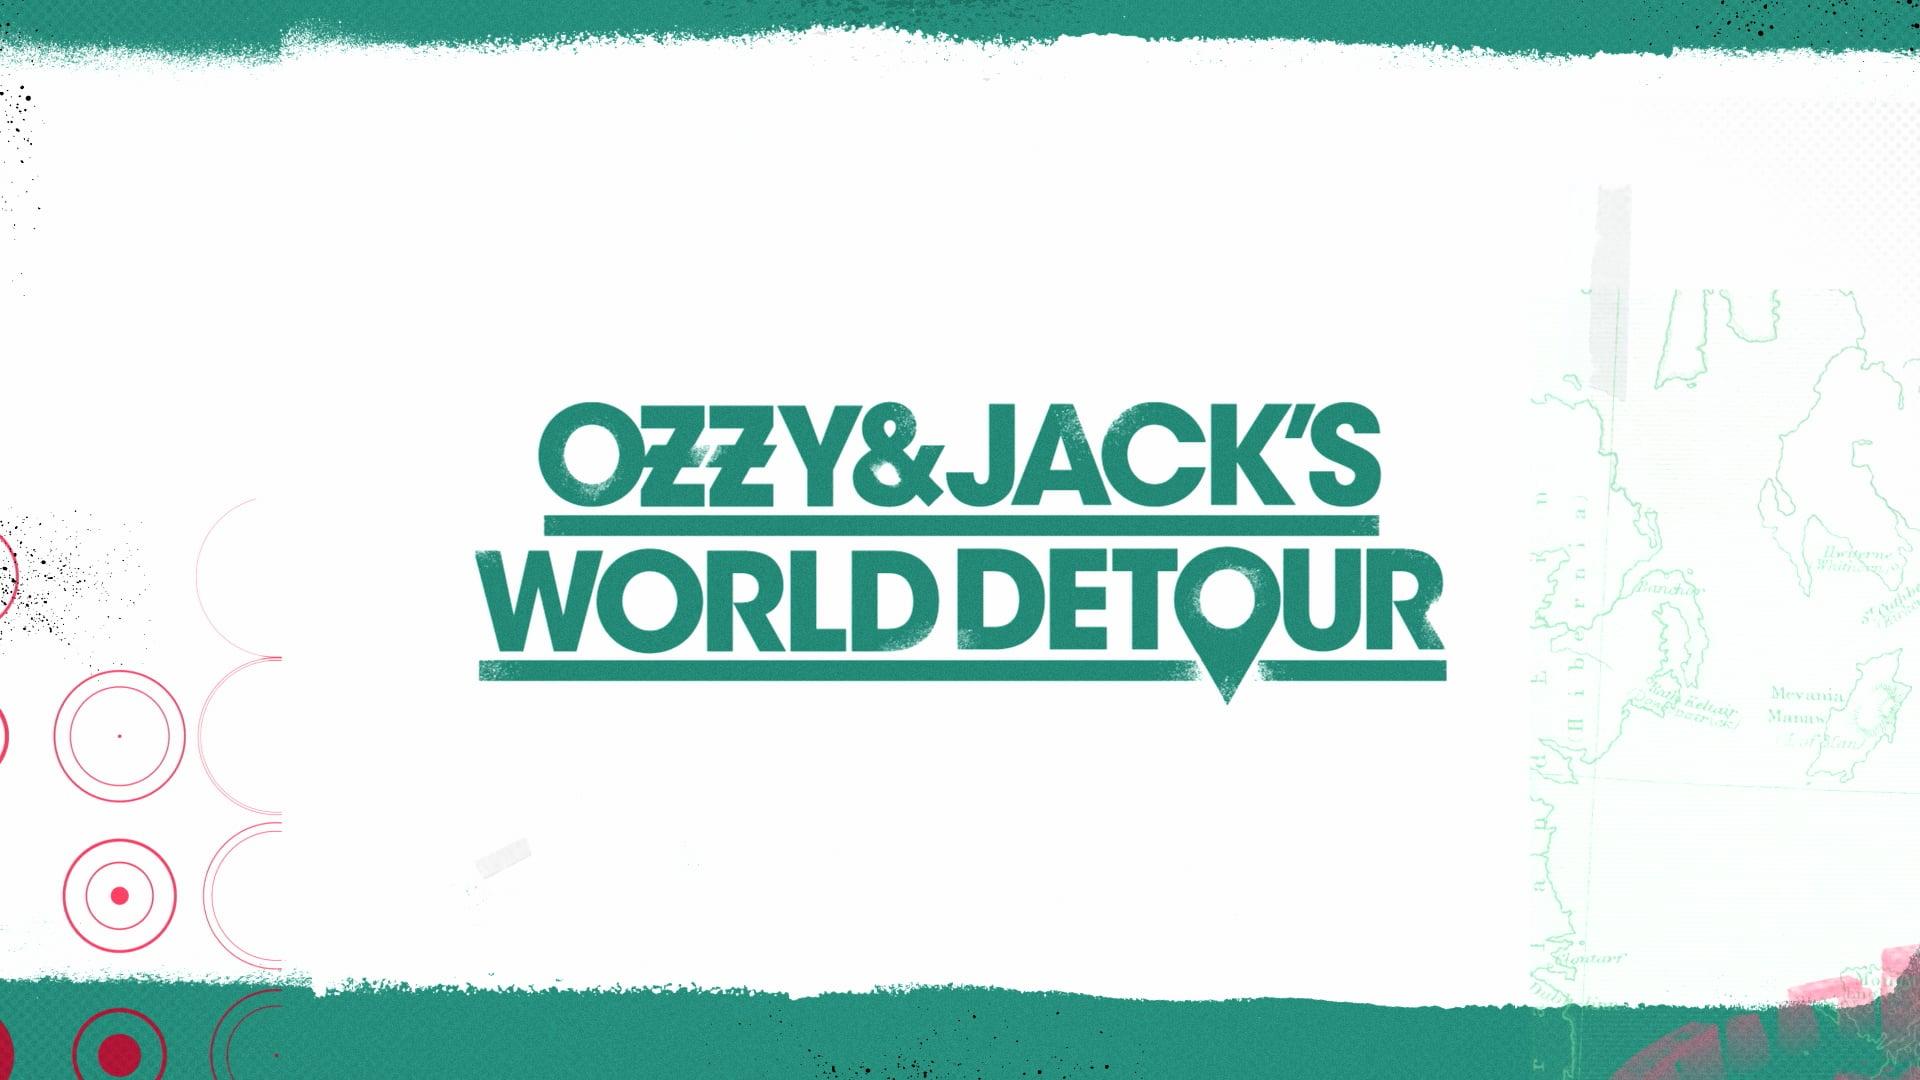 Ozzy & Jack's World Detour - Season 3 Travel Maps